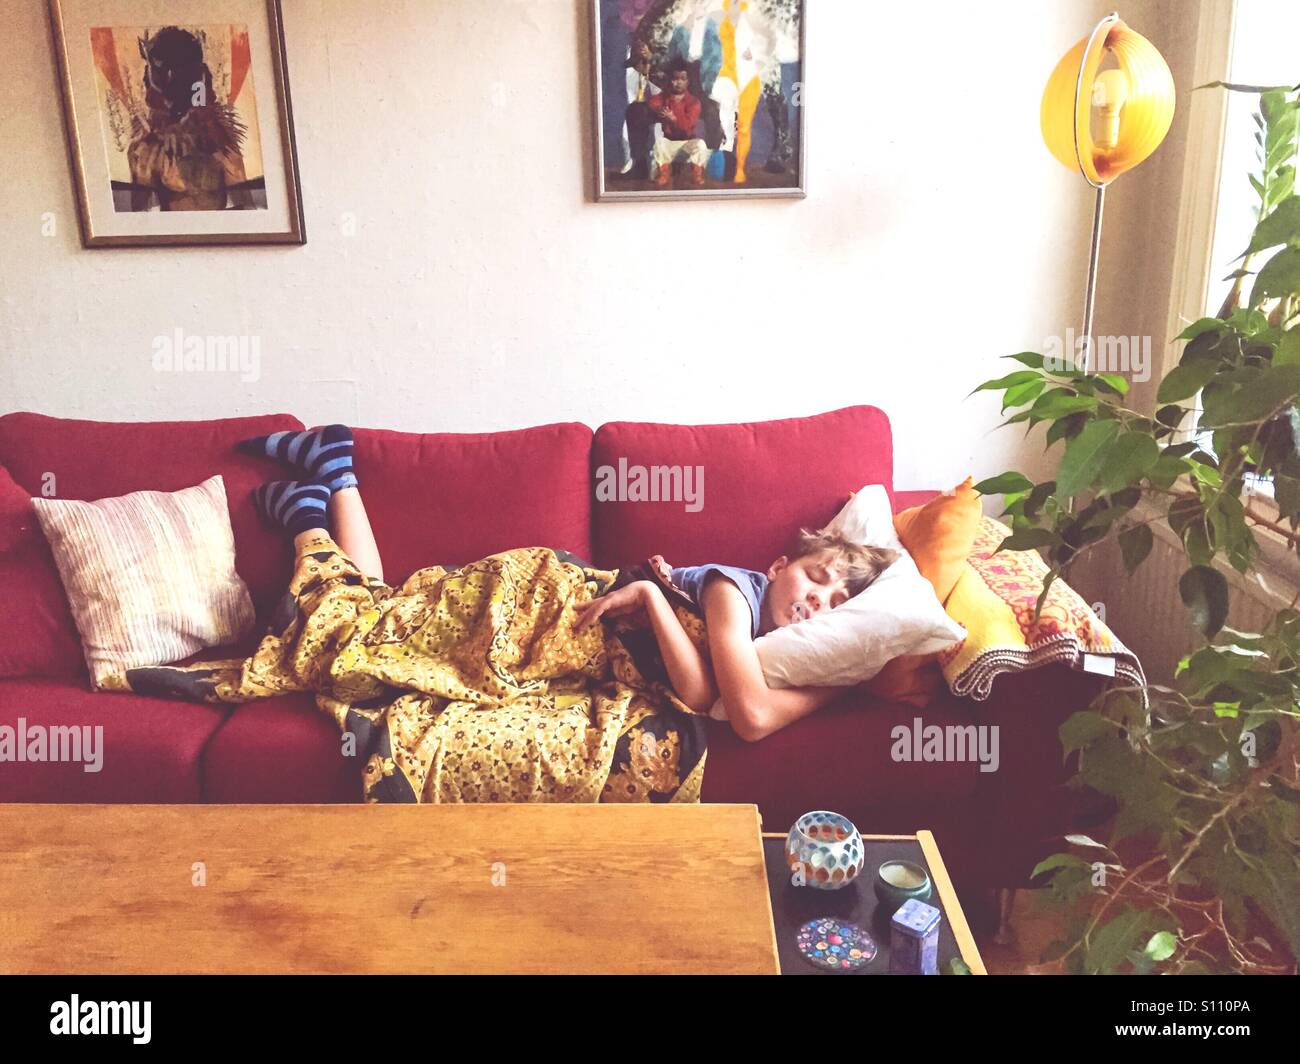 Sleeping boy on the sofa - Stock Image